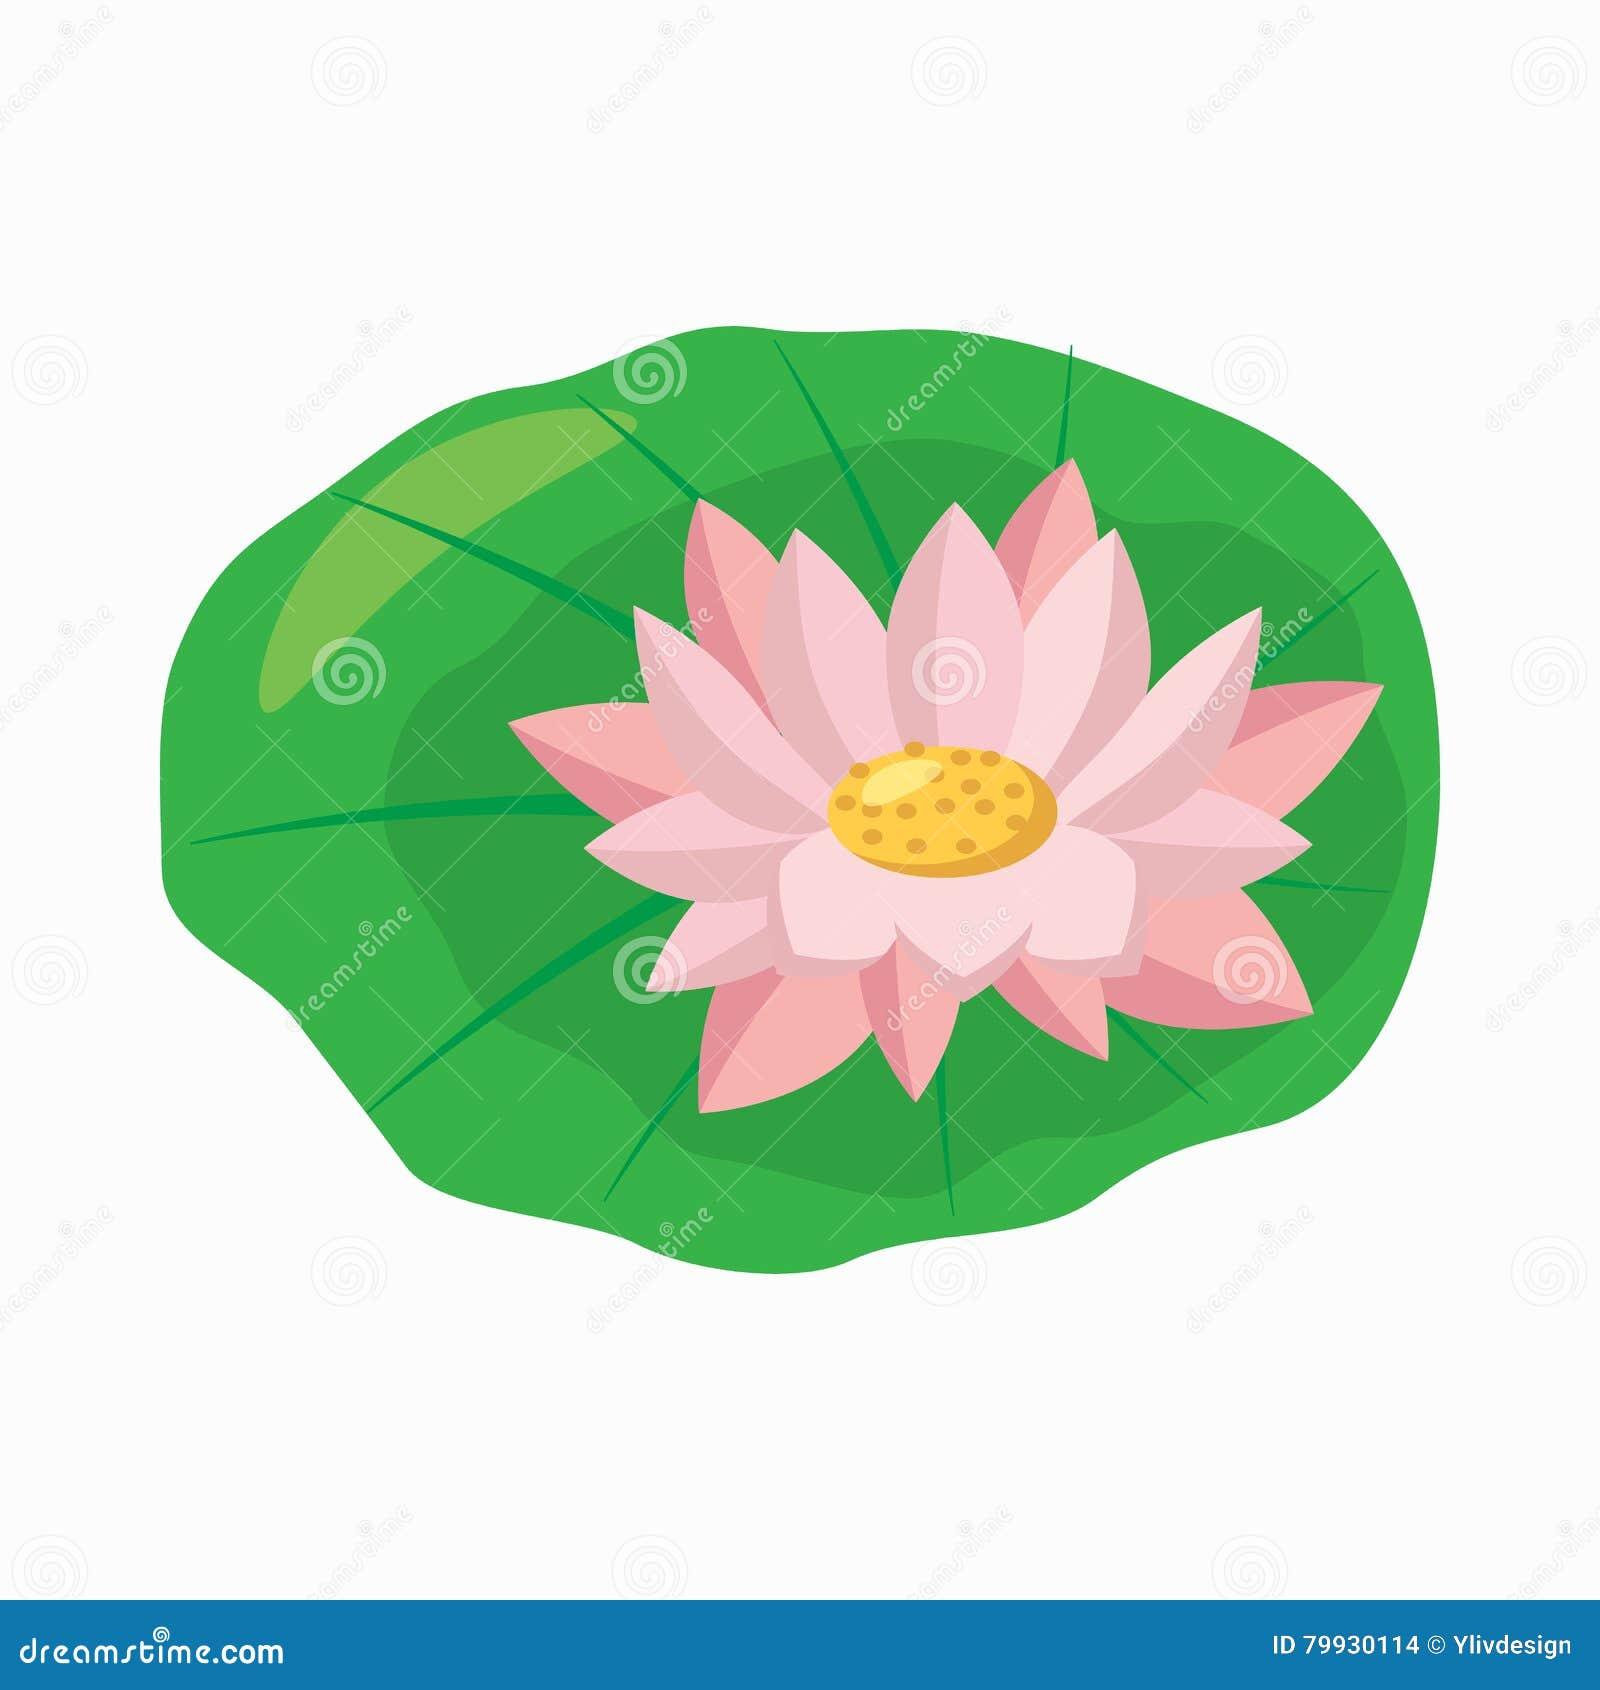 Lotus flower icon cartoon style stock vector illustration of lotus flower icon cartoon style izmirmasajfo